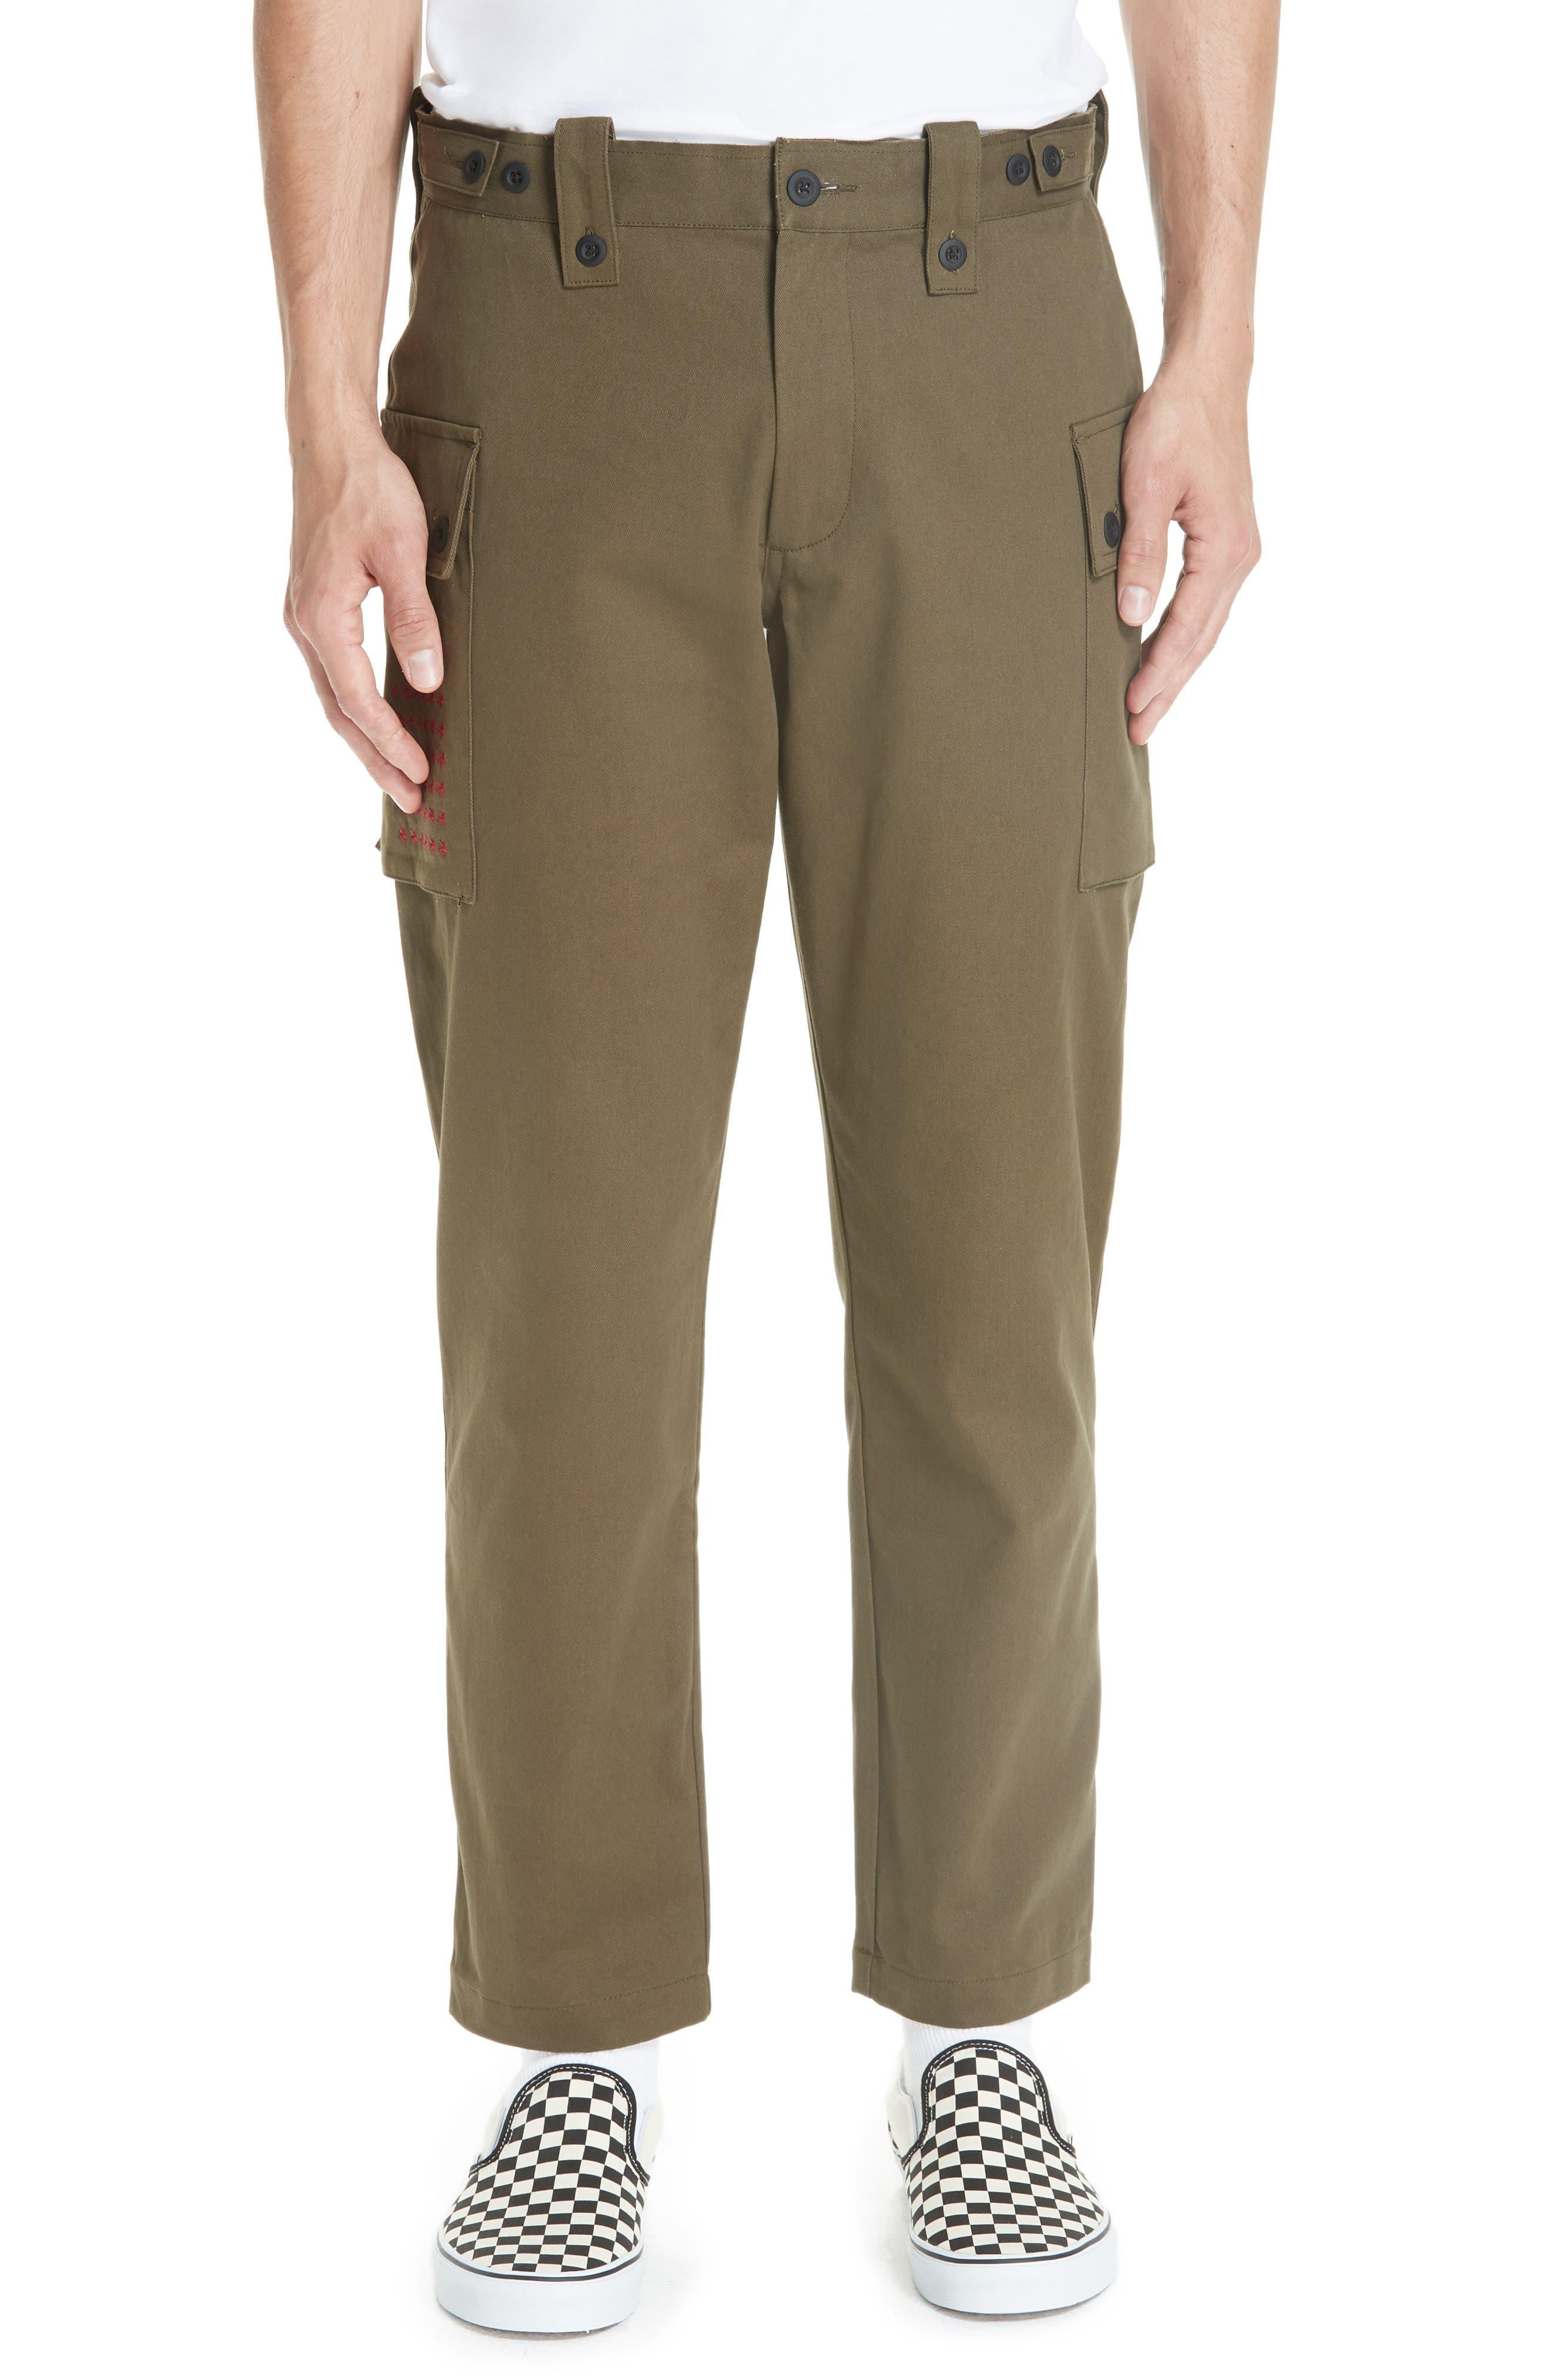 Storm Utility Cargo Pants,                         Main,                         color, OLIVE